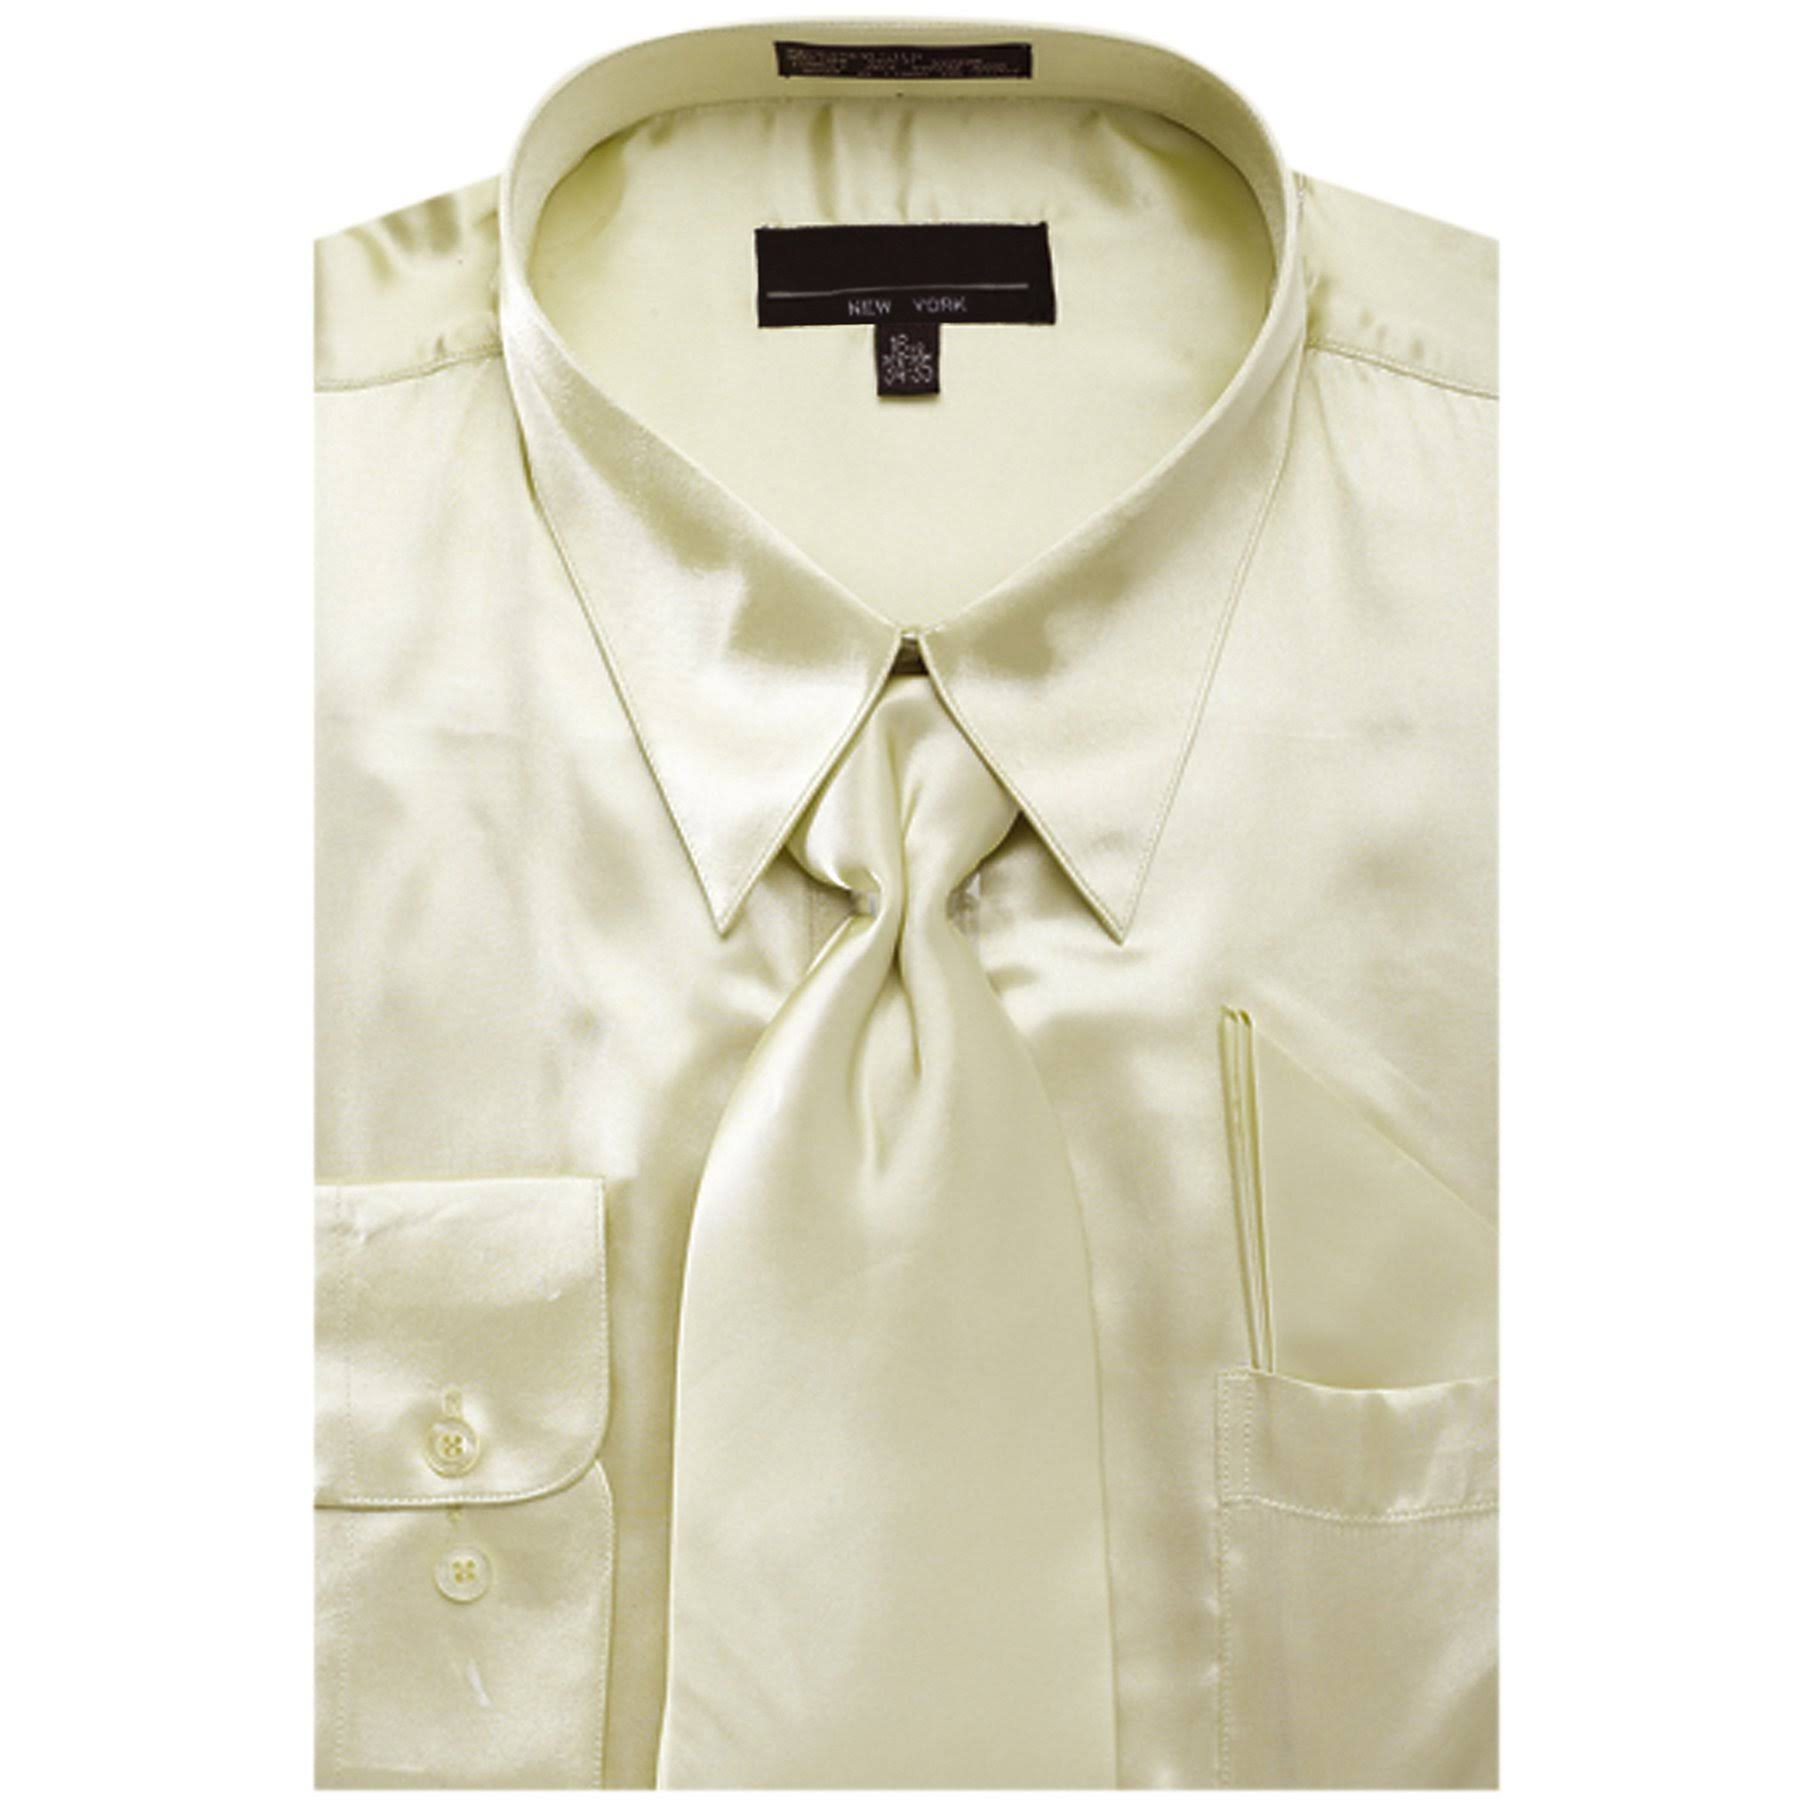 Tamaño Oliva En 5 Verde Sunrise Satén 15 35 De Outlet Para Camisa Y Liso 34 Color Vestir Hombre Pañuelo Corbata tqOZSH